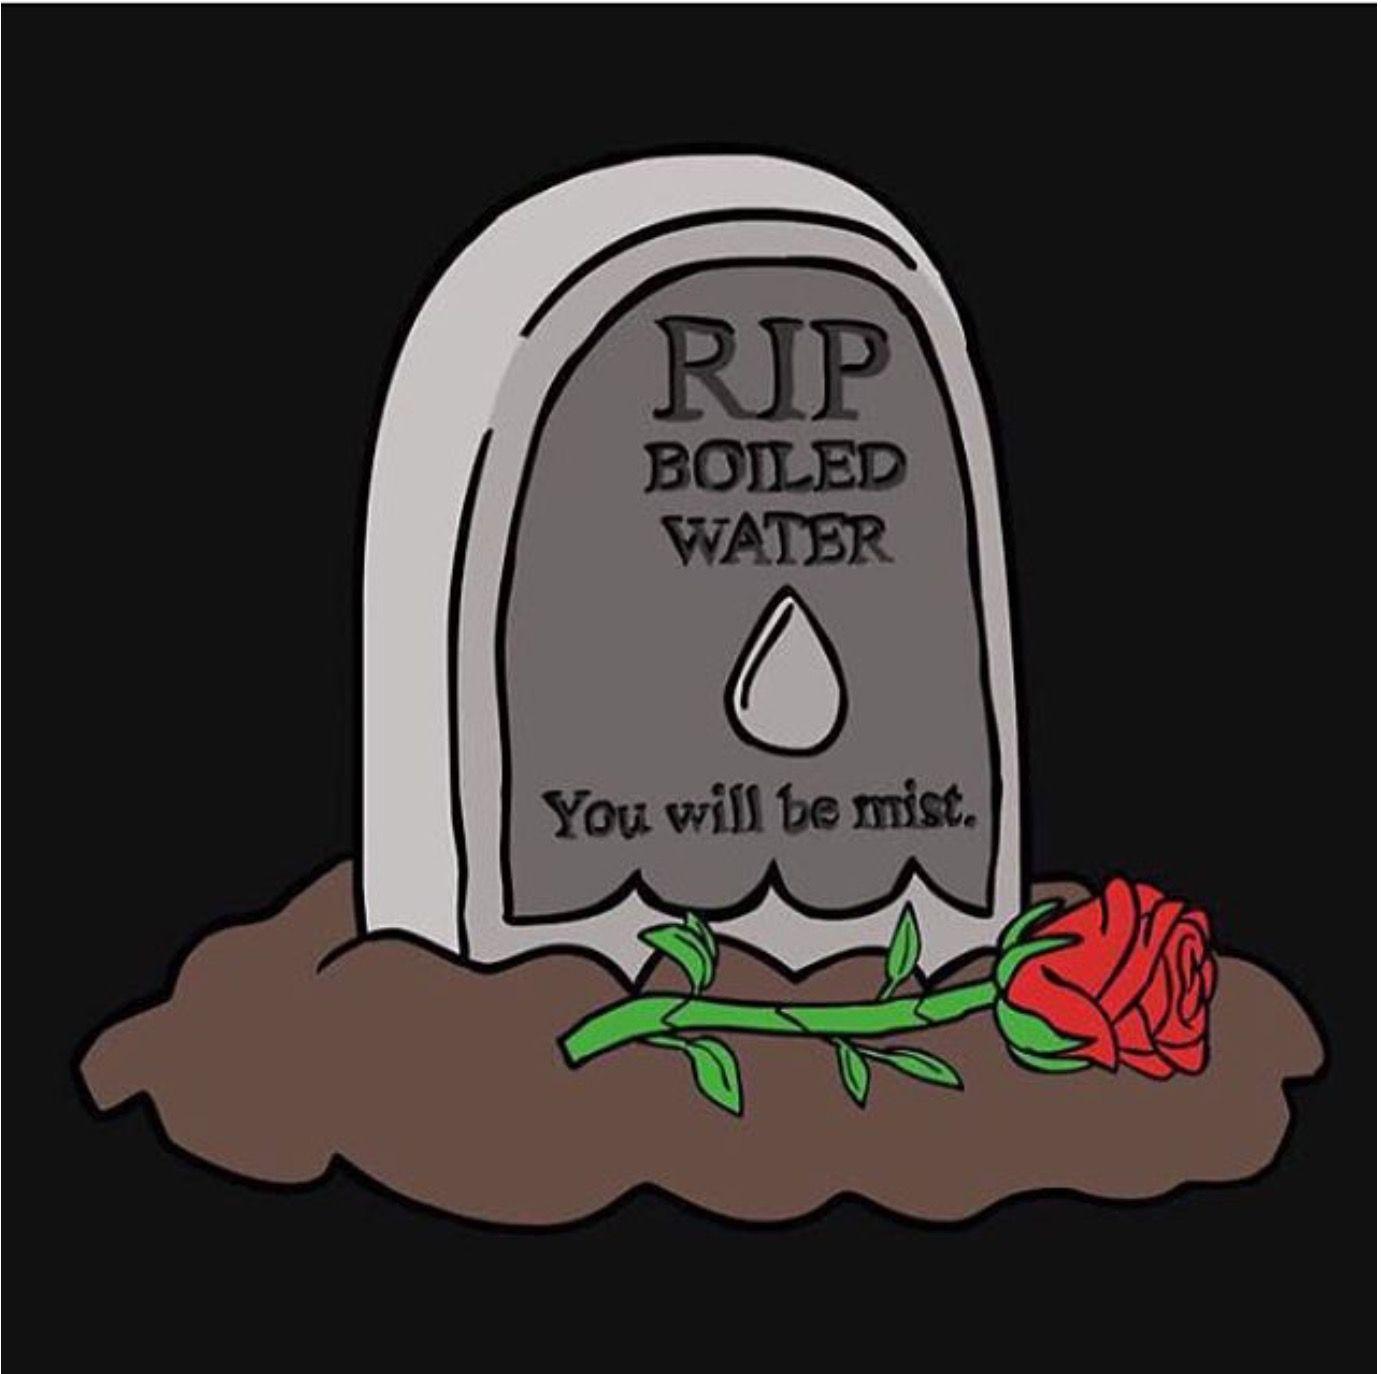 RIP Boiling water. You'll be mist #punny   Funny puns jokes, Nerdy jokes,  Punny jokes